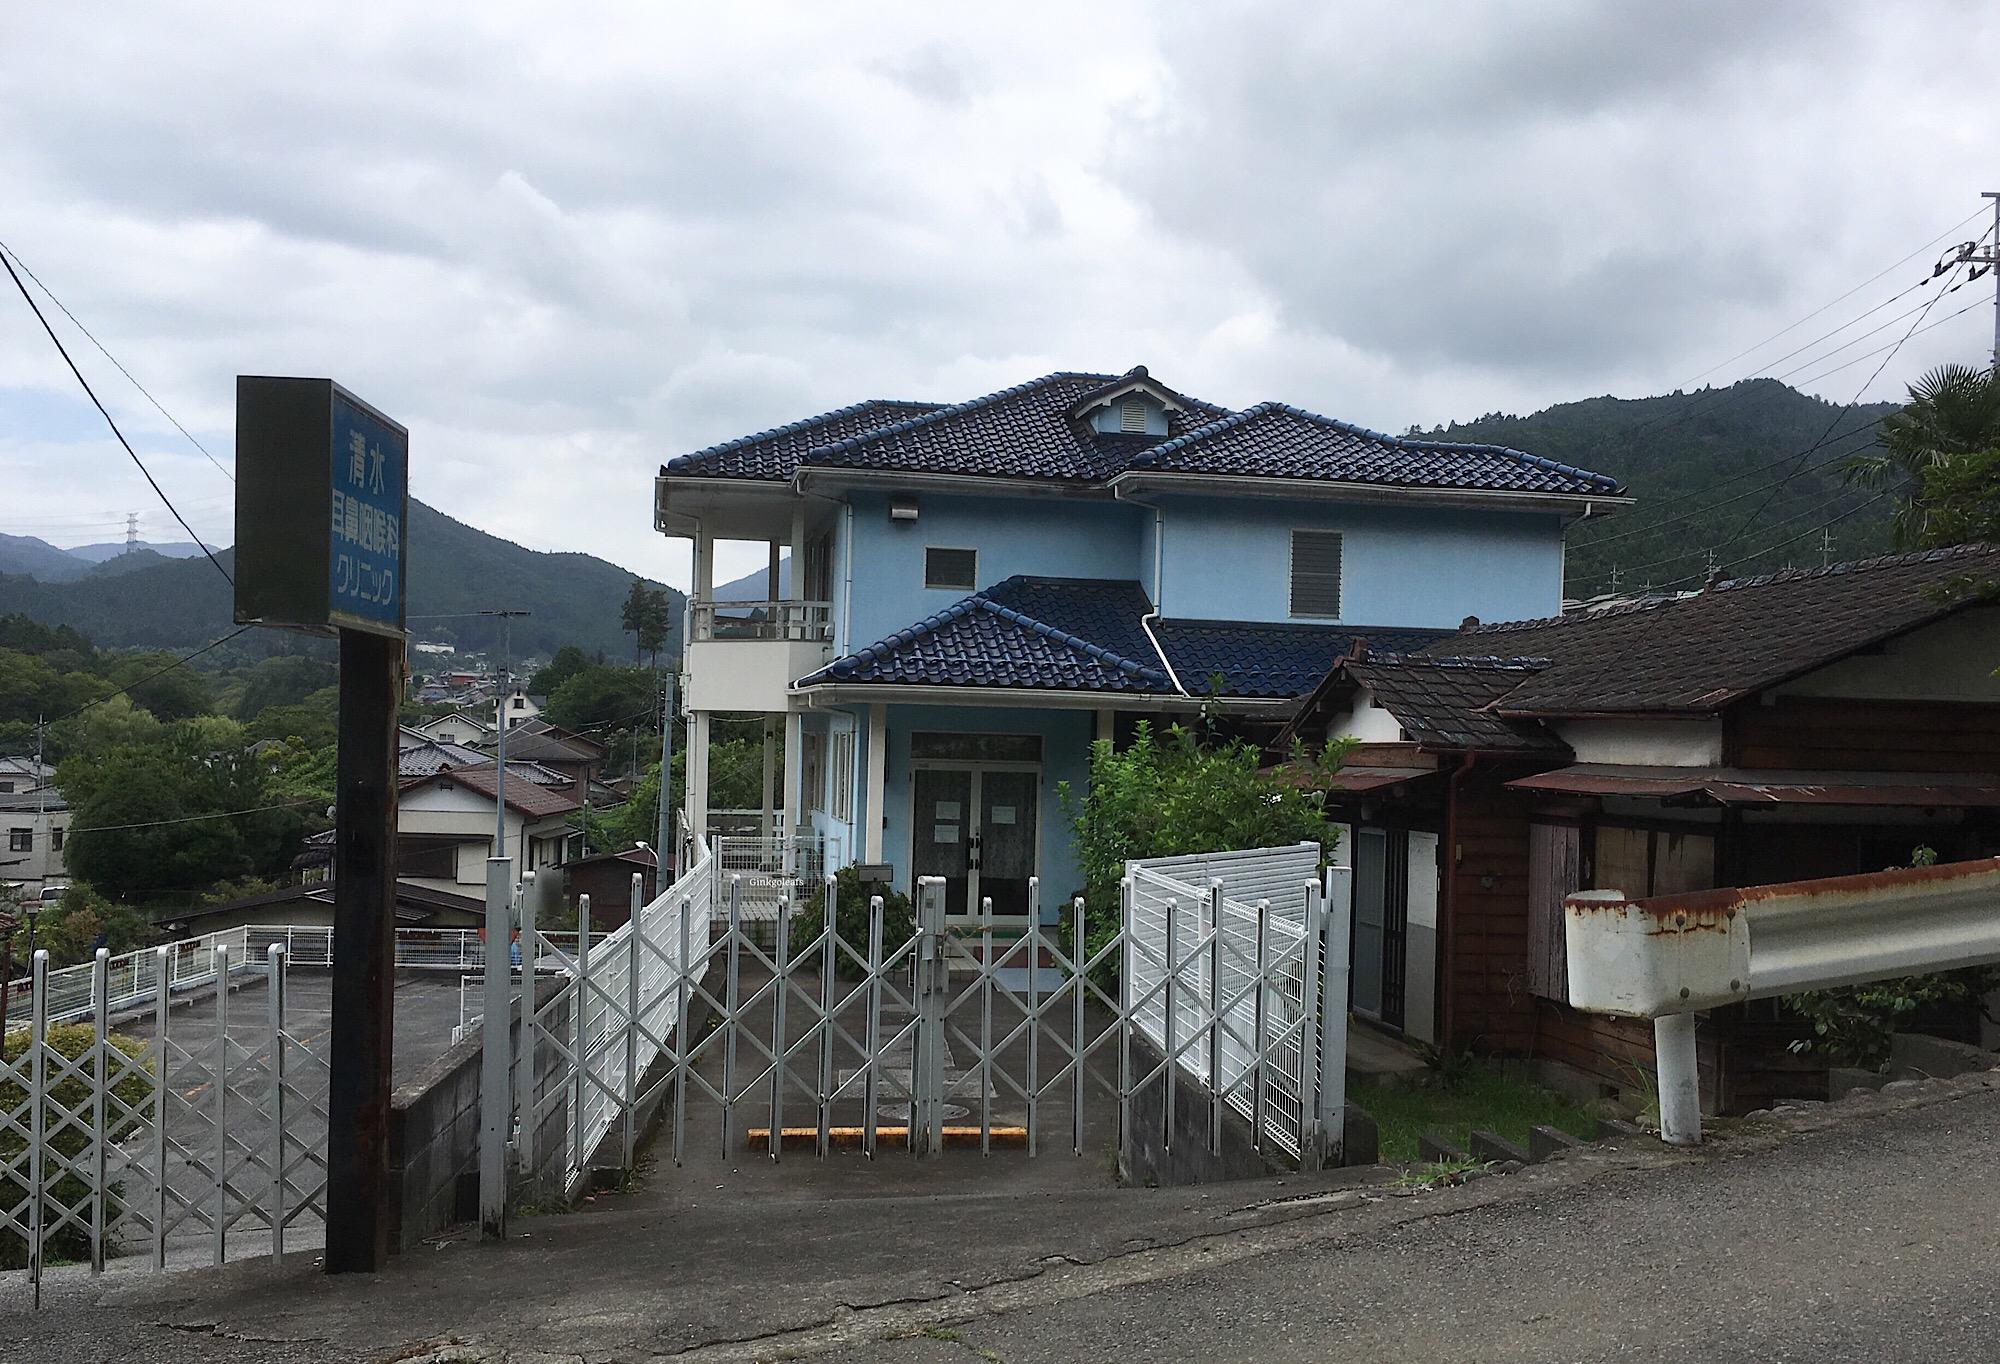 Leeres Haus